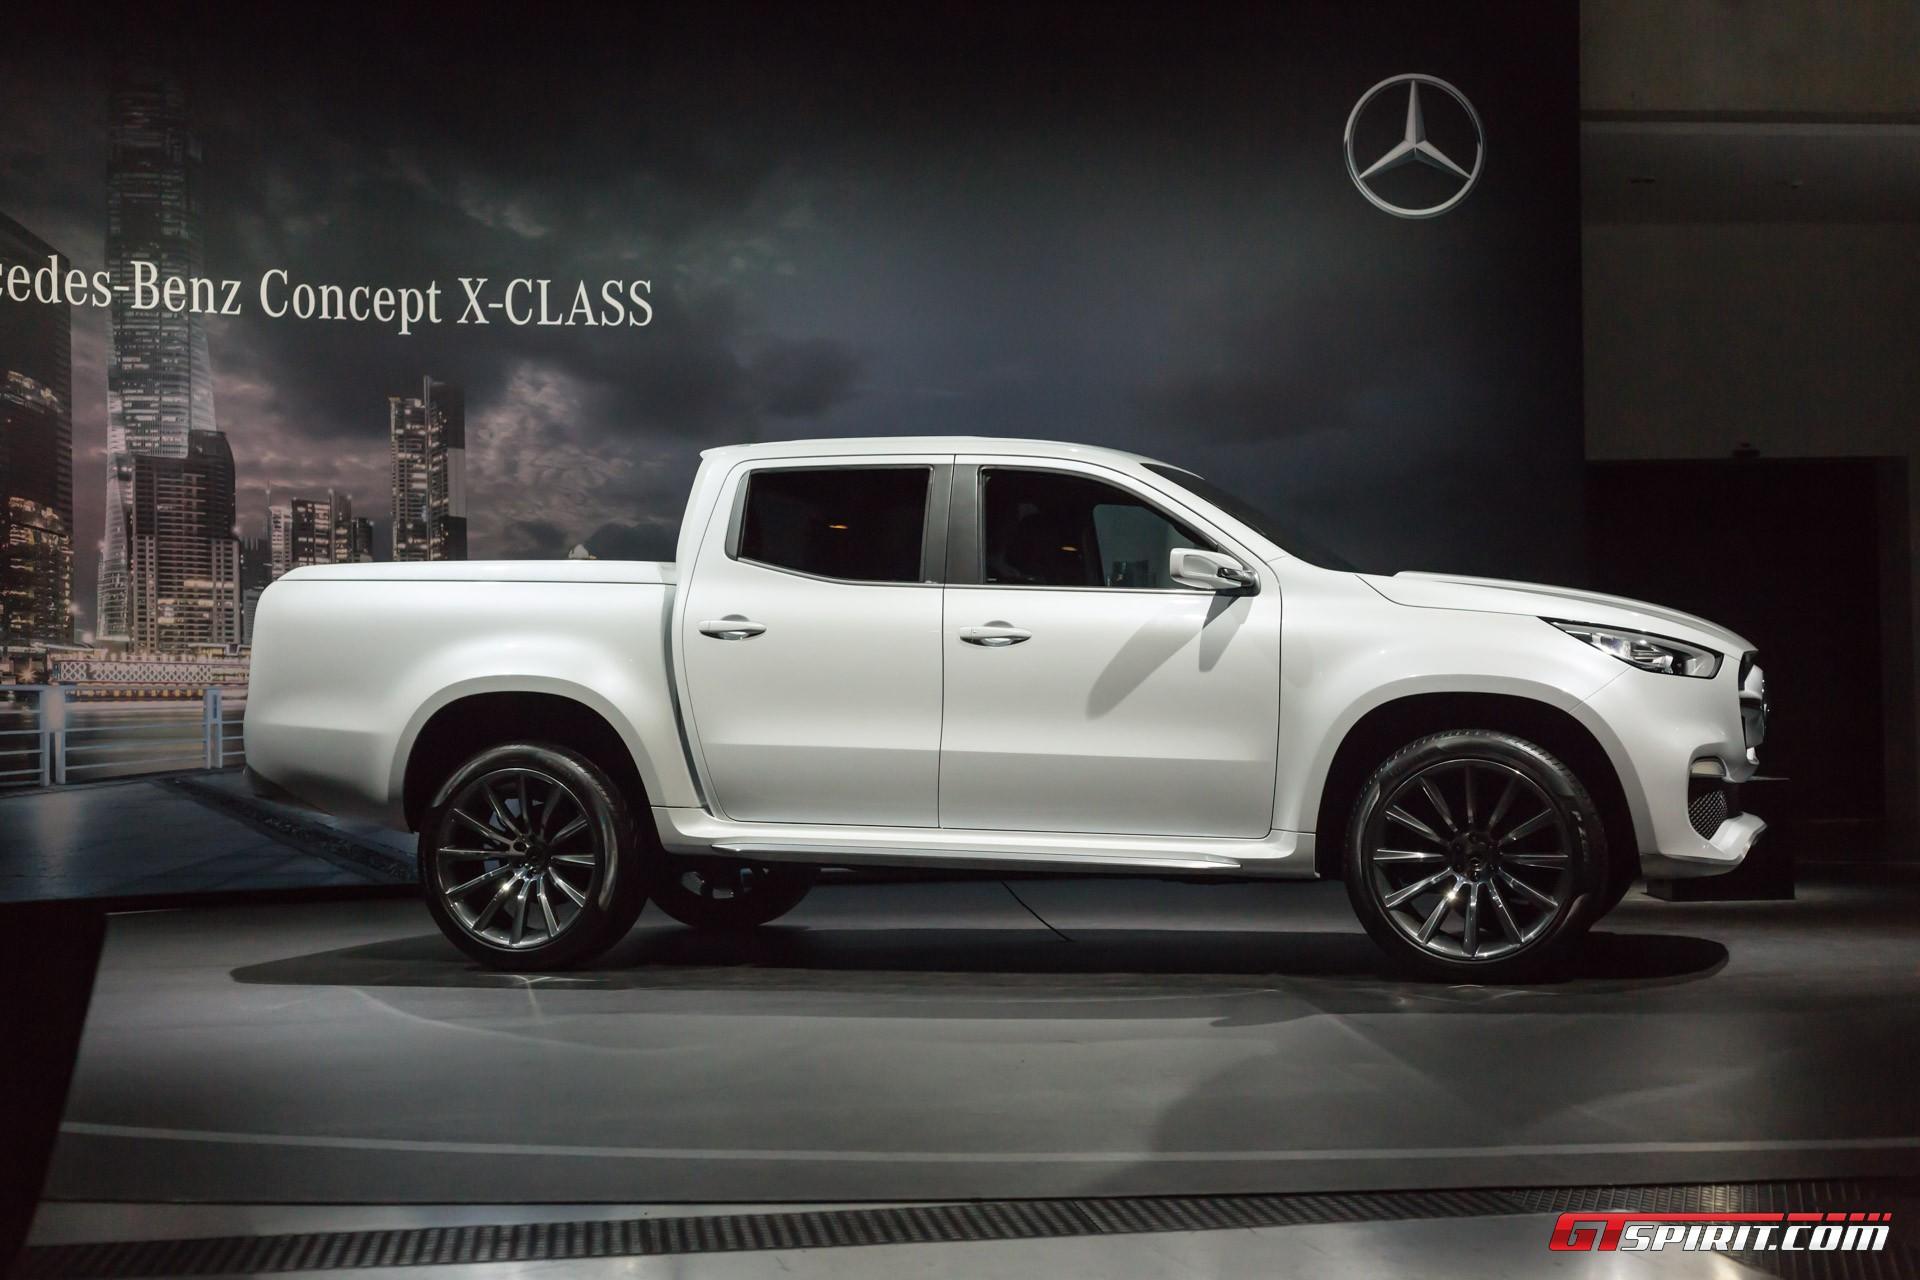 Mercedes-Benz X-Class Concept at the Geneva Motor Show 2017